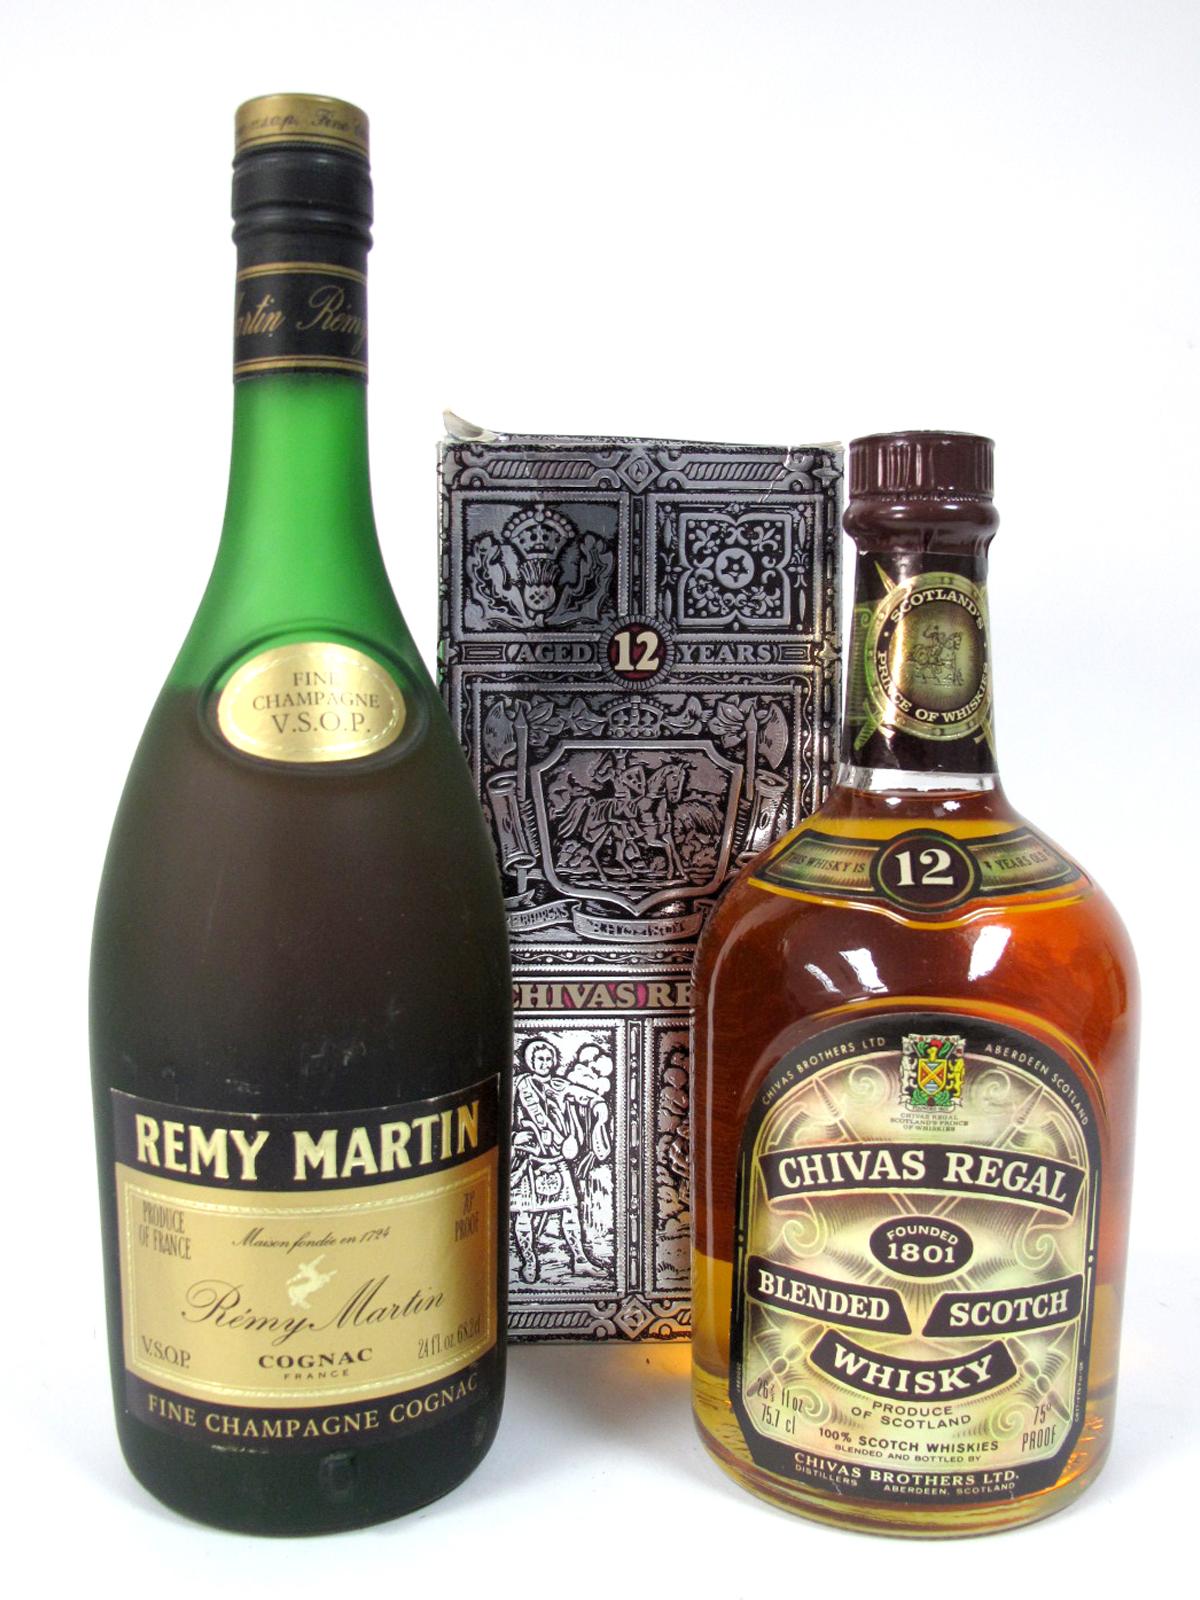 Lot 59 - Spirits - Remy Martin V.S.O.P Fine Champagne Cognac, 70% proof, 68.2cl; Chivas regal Blended